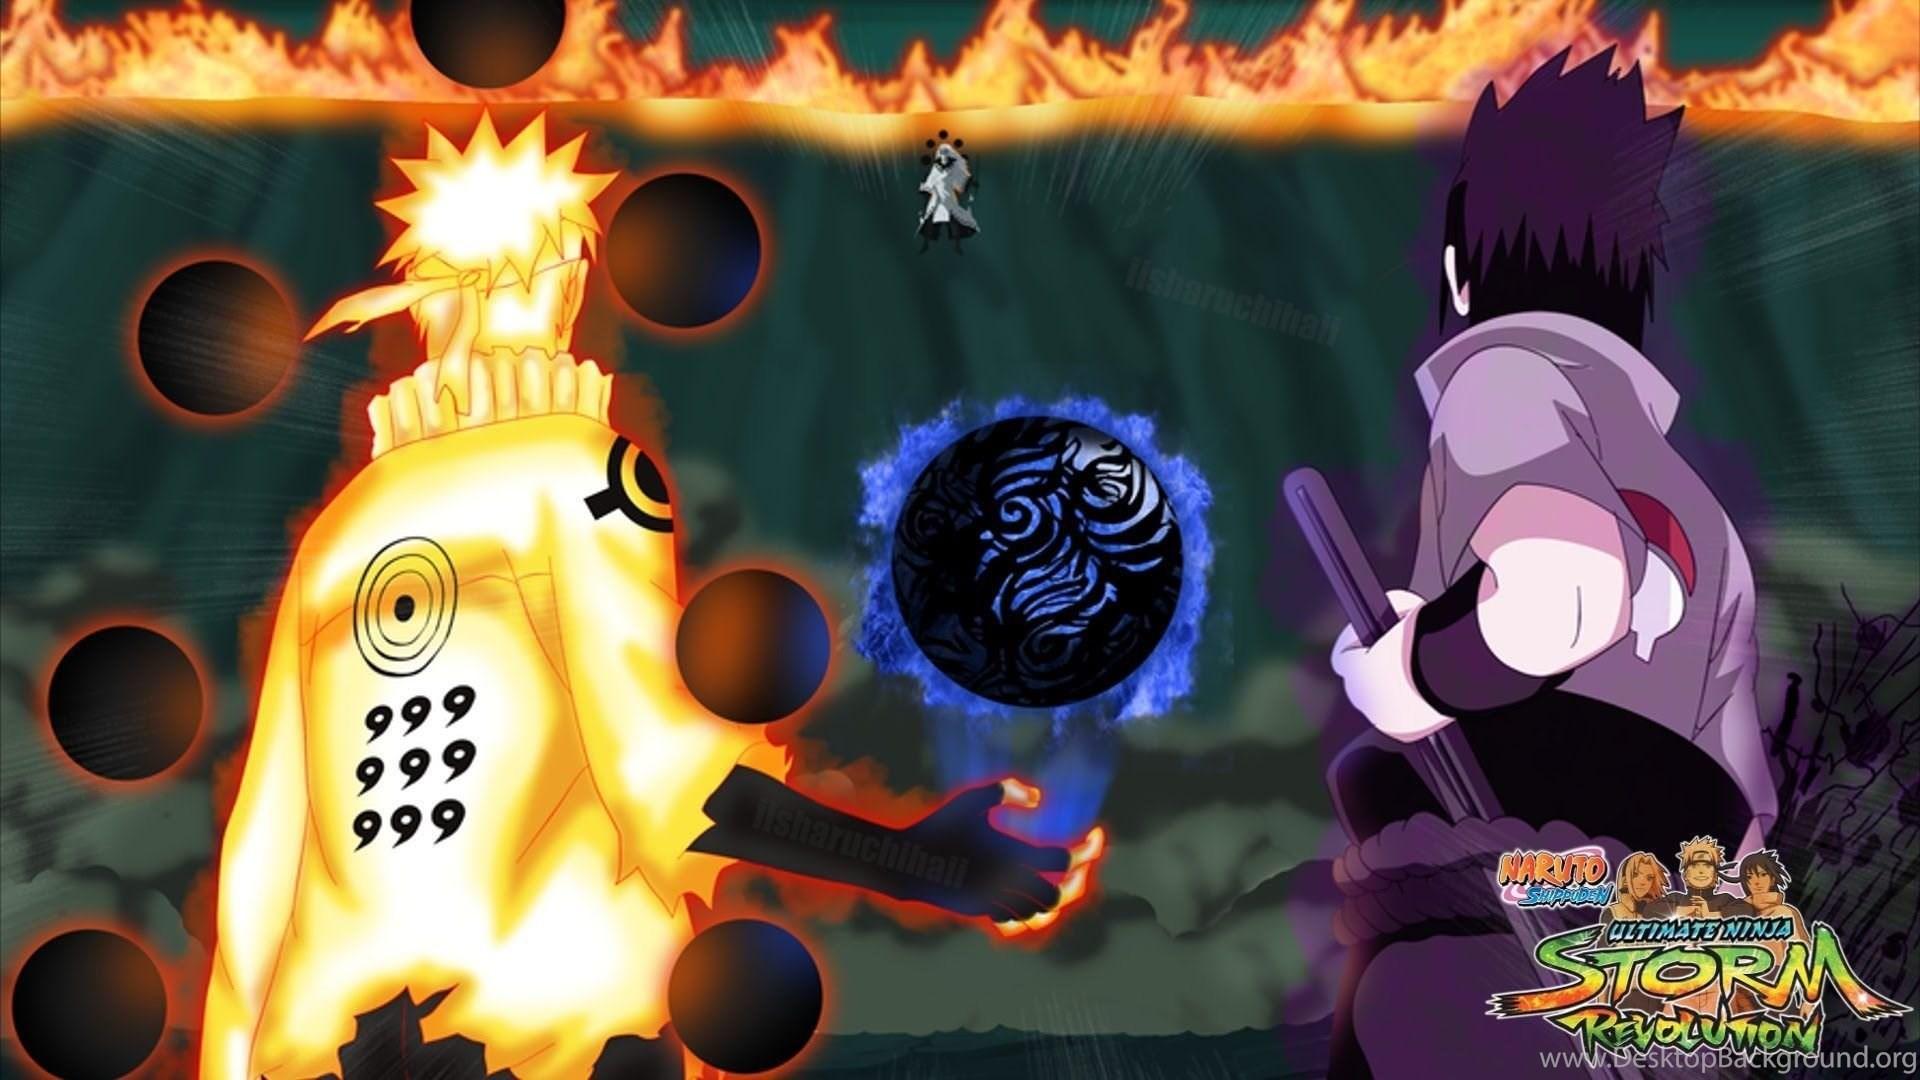 Naruto And Sasuke Vs Madara Wallpapers Desktop Background